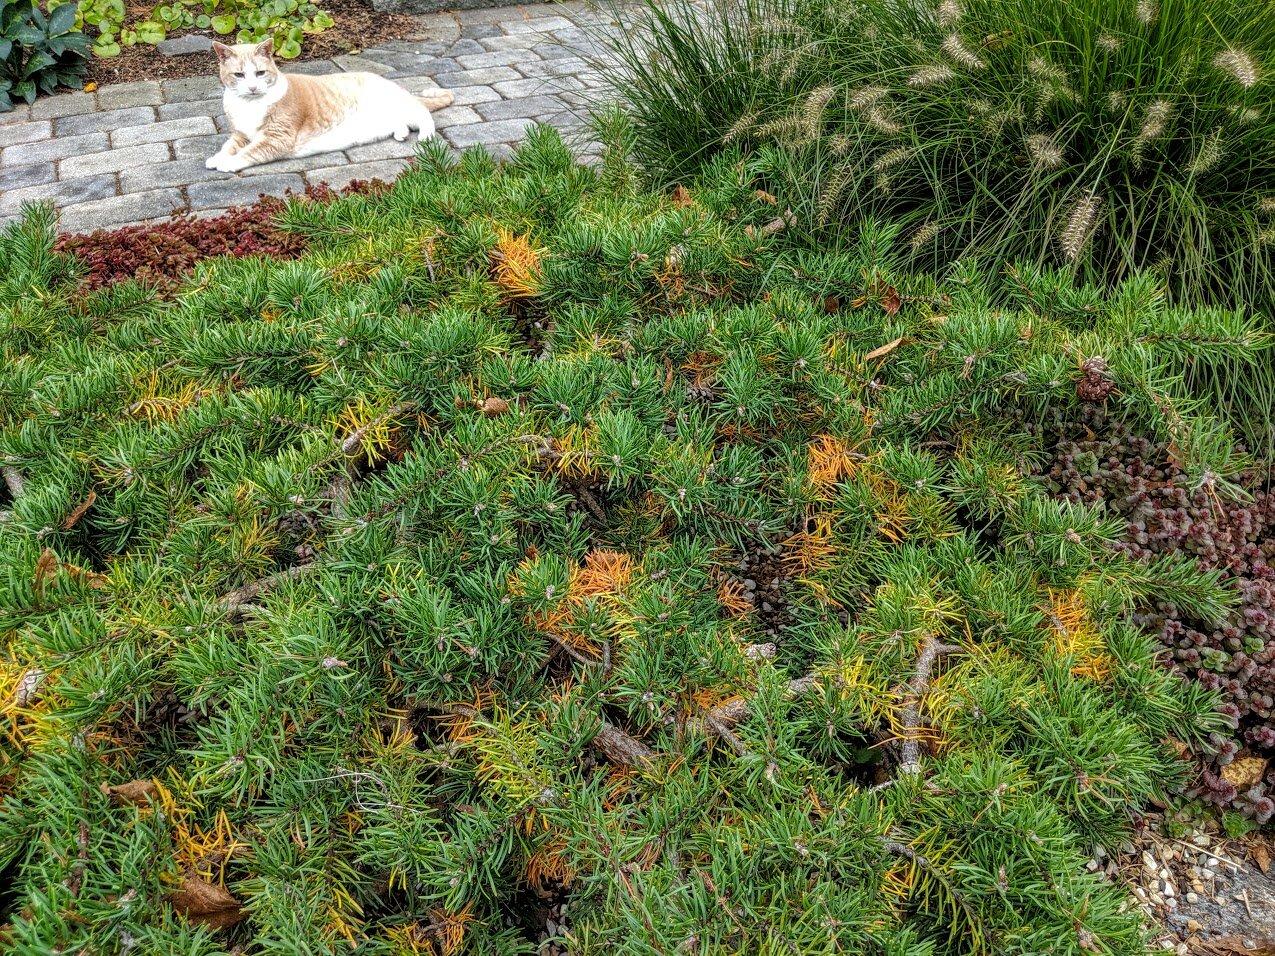 'Schoodic' Jack pine